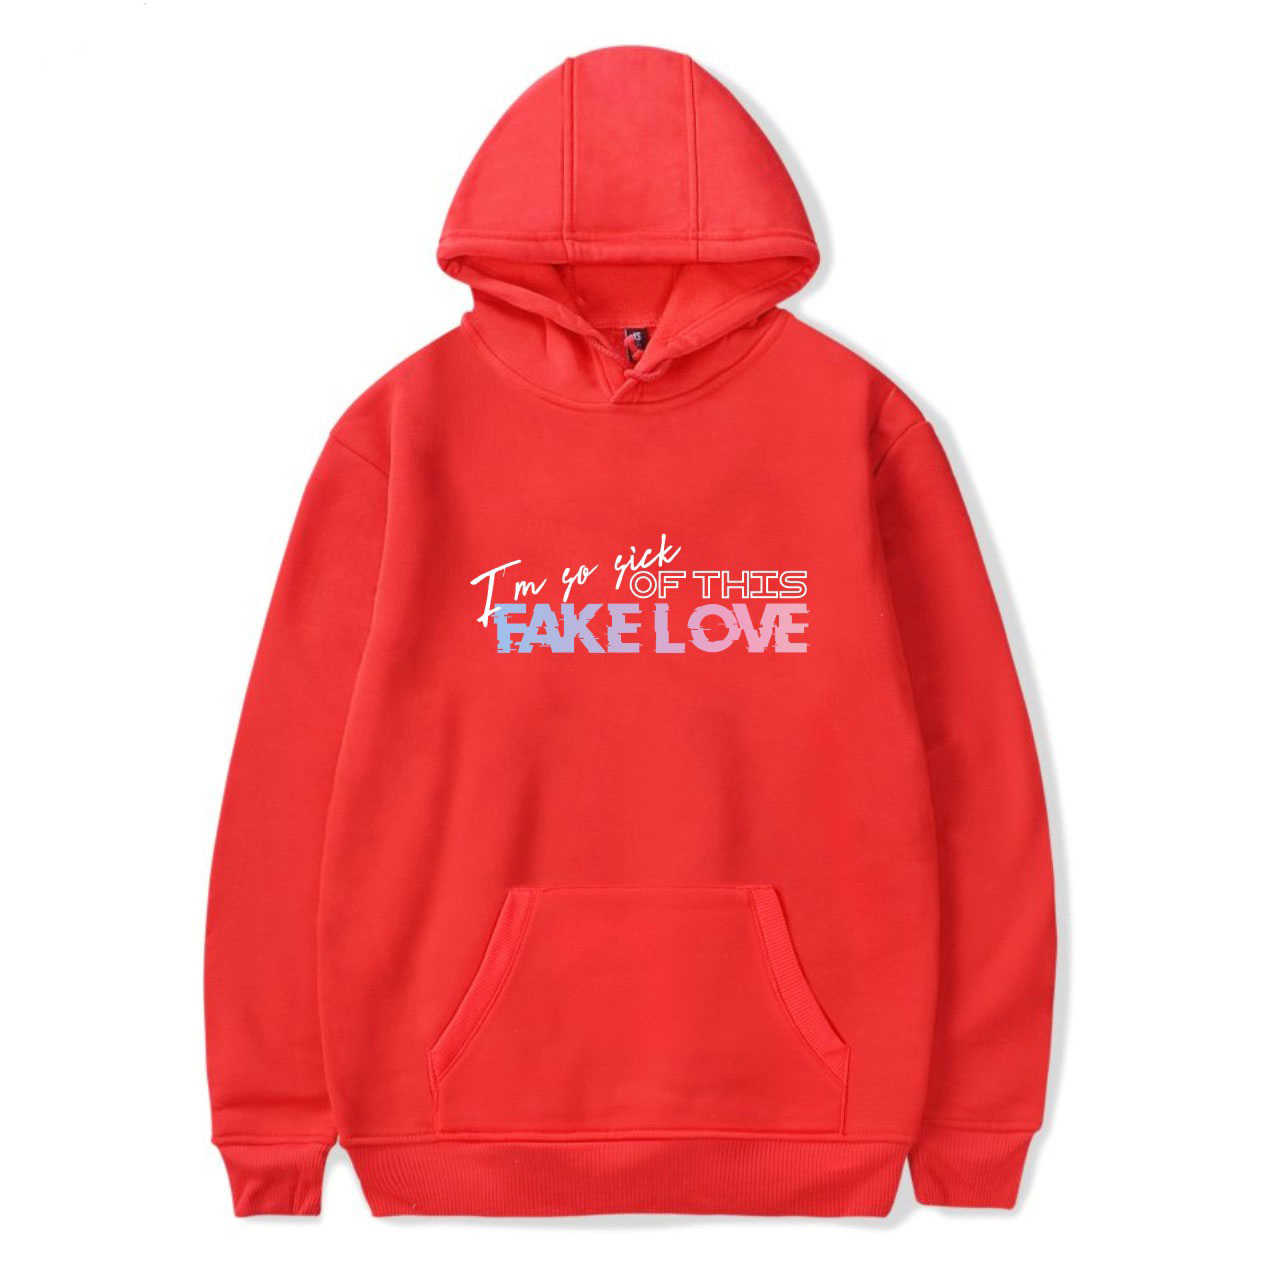 Aikooki baumwolle Sweatshirt Hoodies Frauen Männer Streetwear Hoodies Mode Beiläufige Hoodies Frauen Männer jacke jungen mädchen hoody kleidung